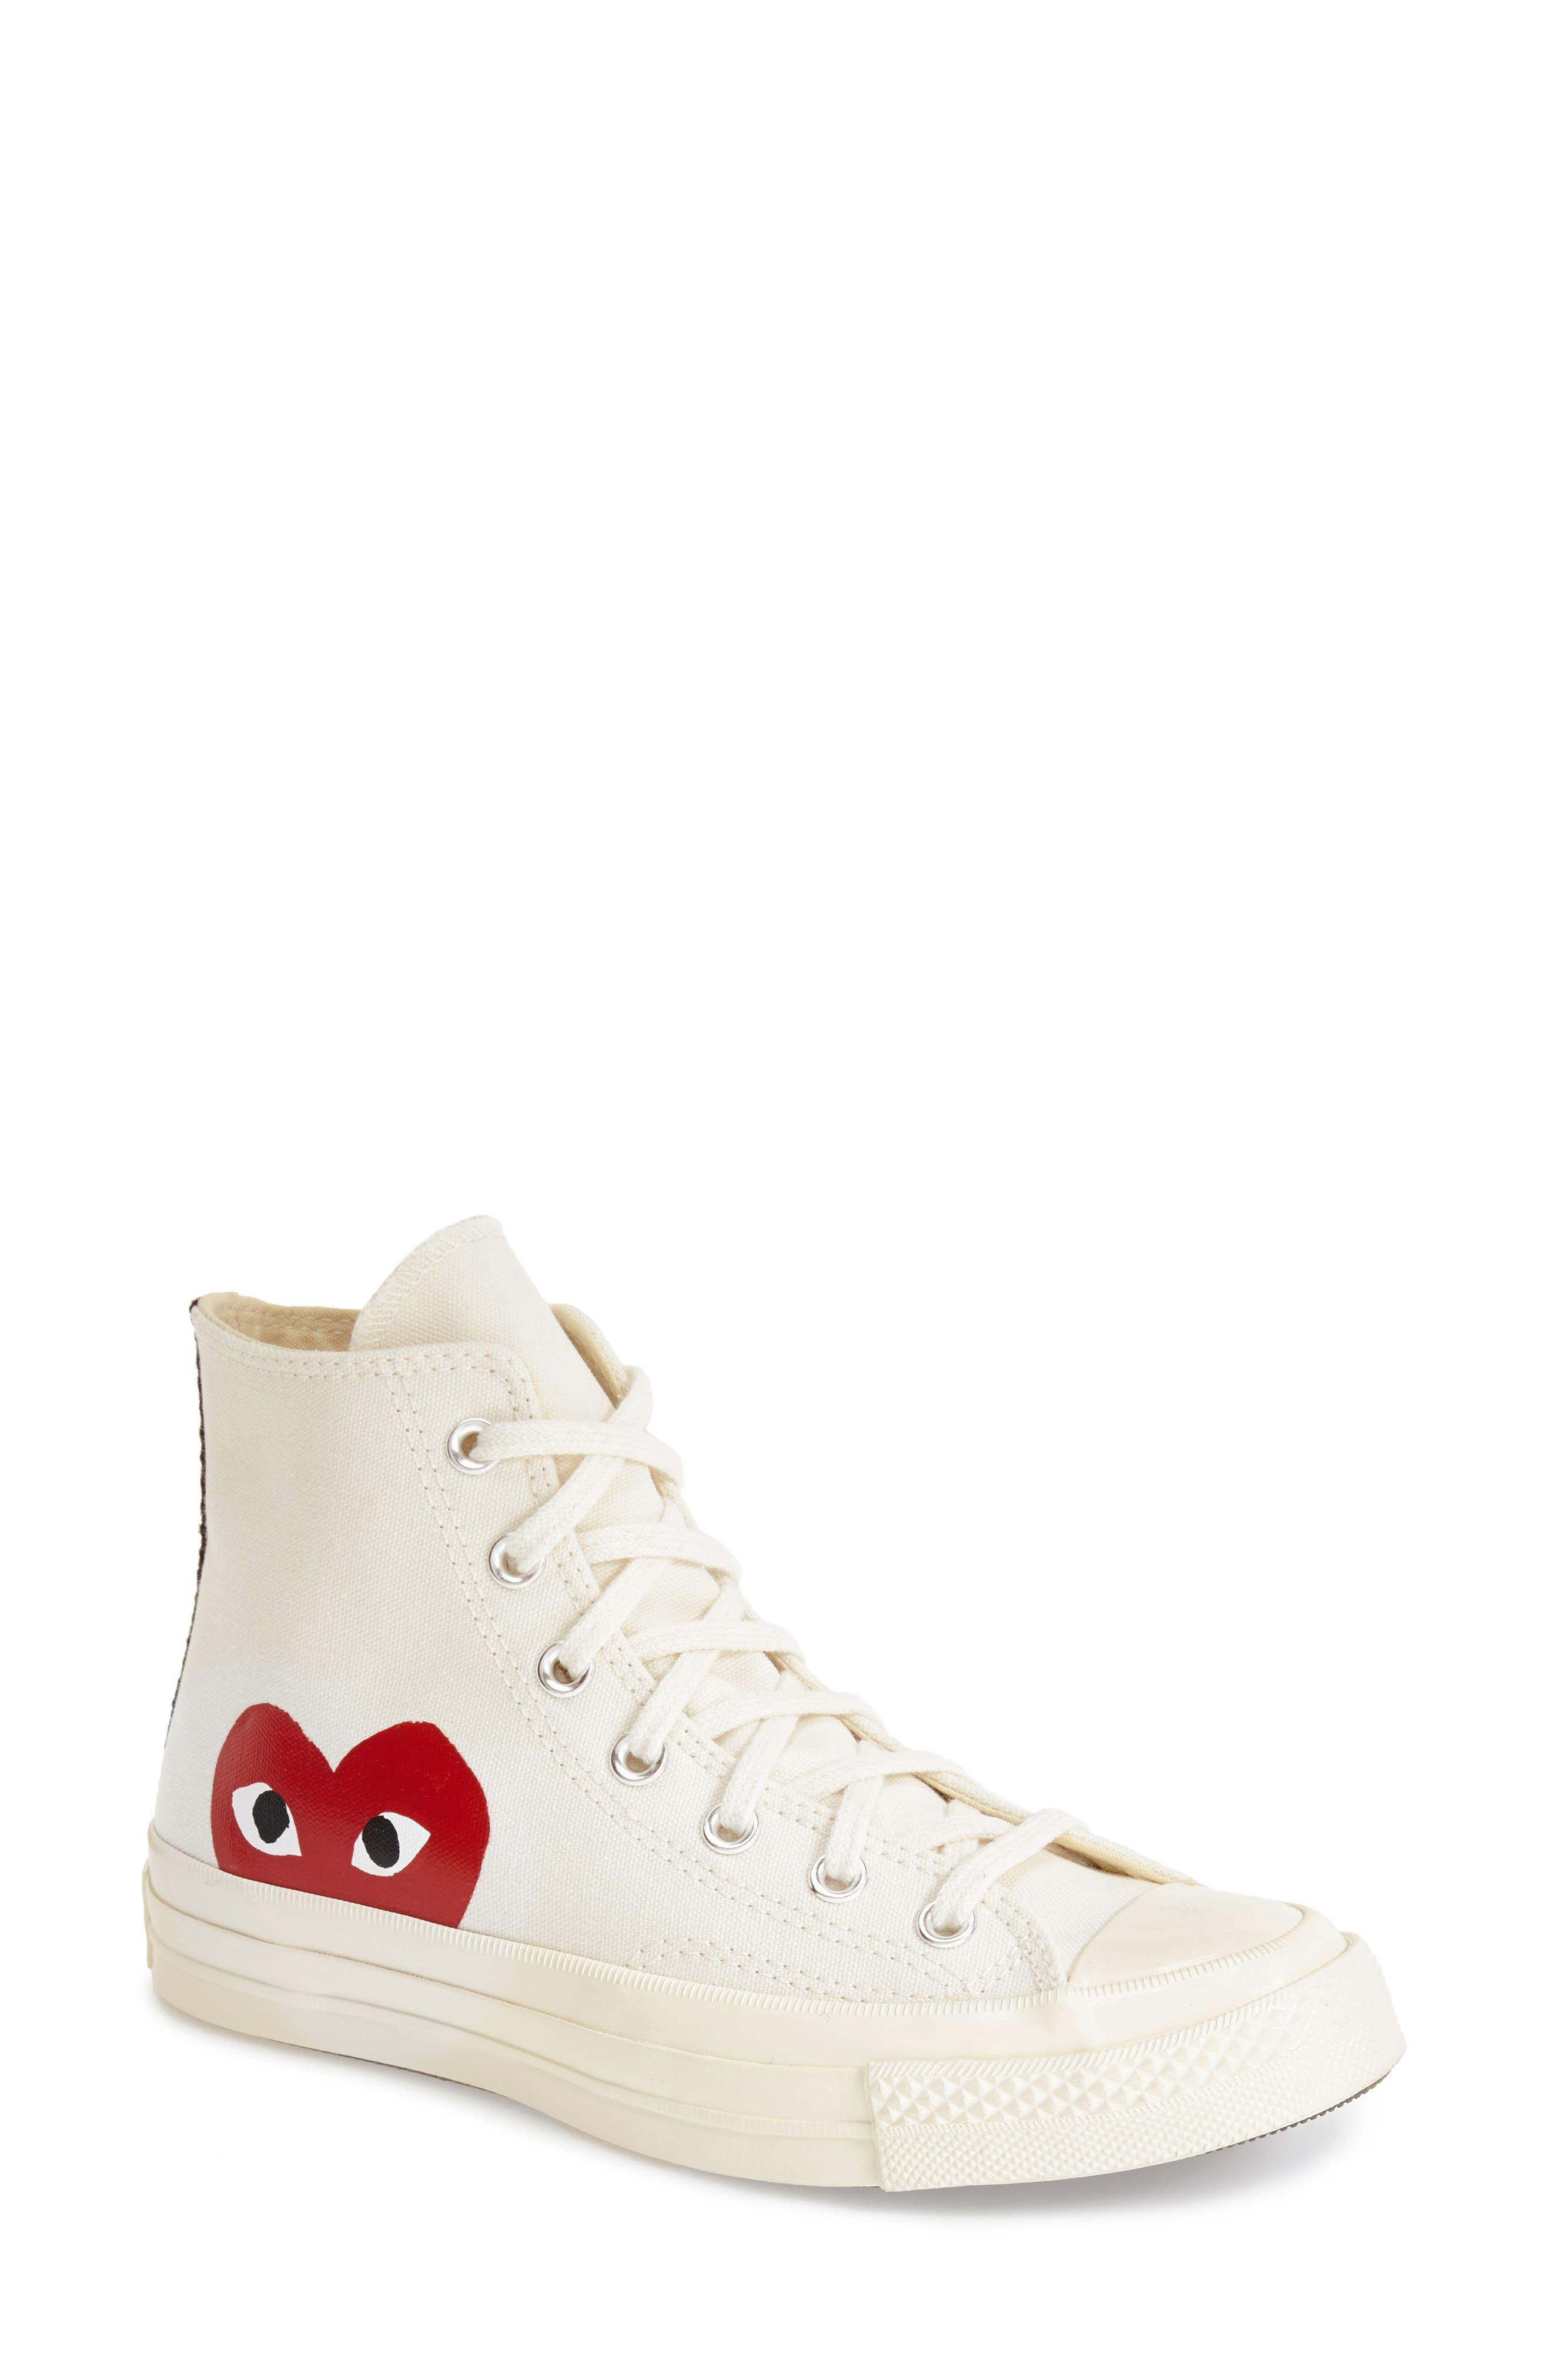 Comme des Garçons PLAYx Converse Chuck Taylor<sup>®</sup> - Hidden Heart High TopSneaker,                         Main,                         color, White Canvas